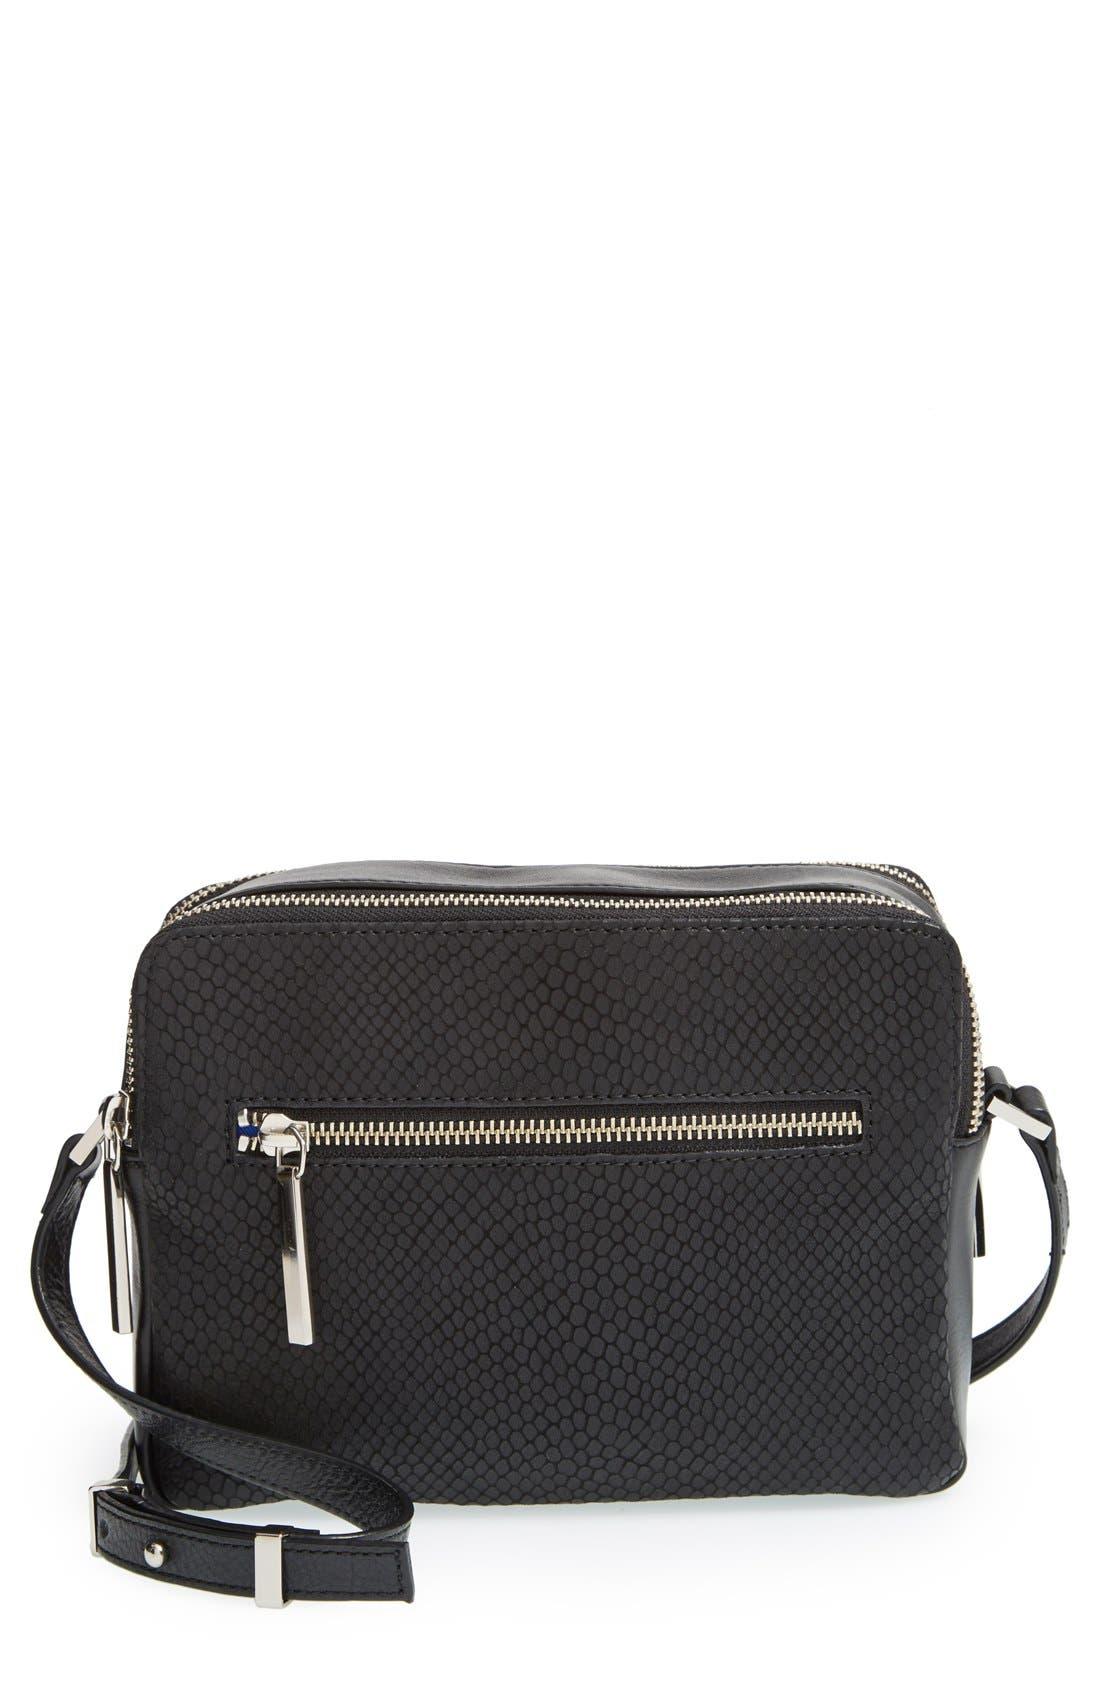 Alternate Image 1 Selected - Halogen® Leather Double Zip Crossbody Bag